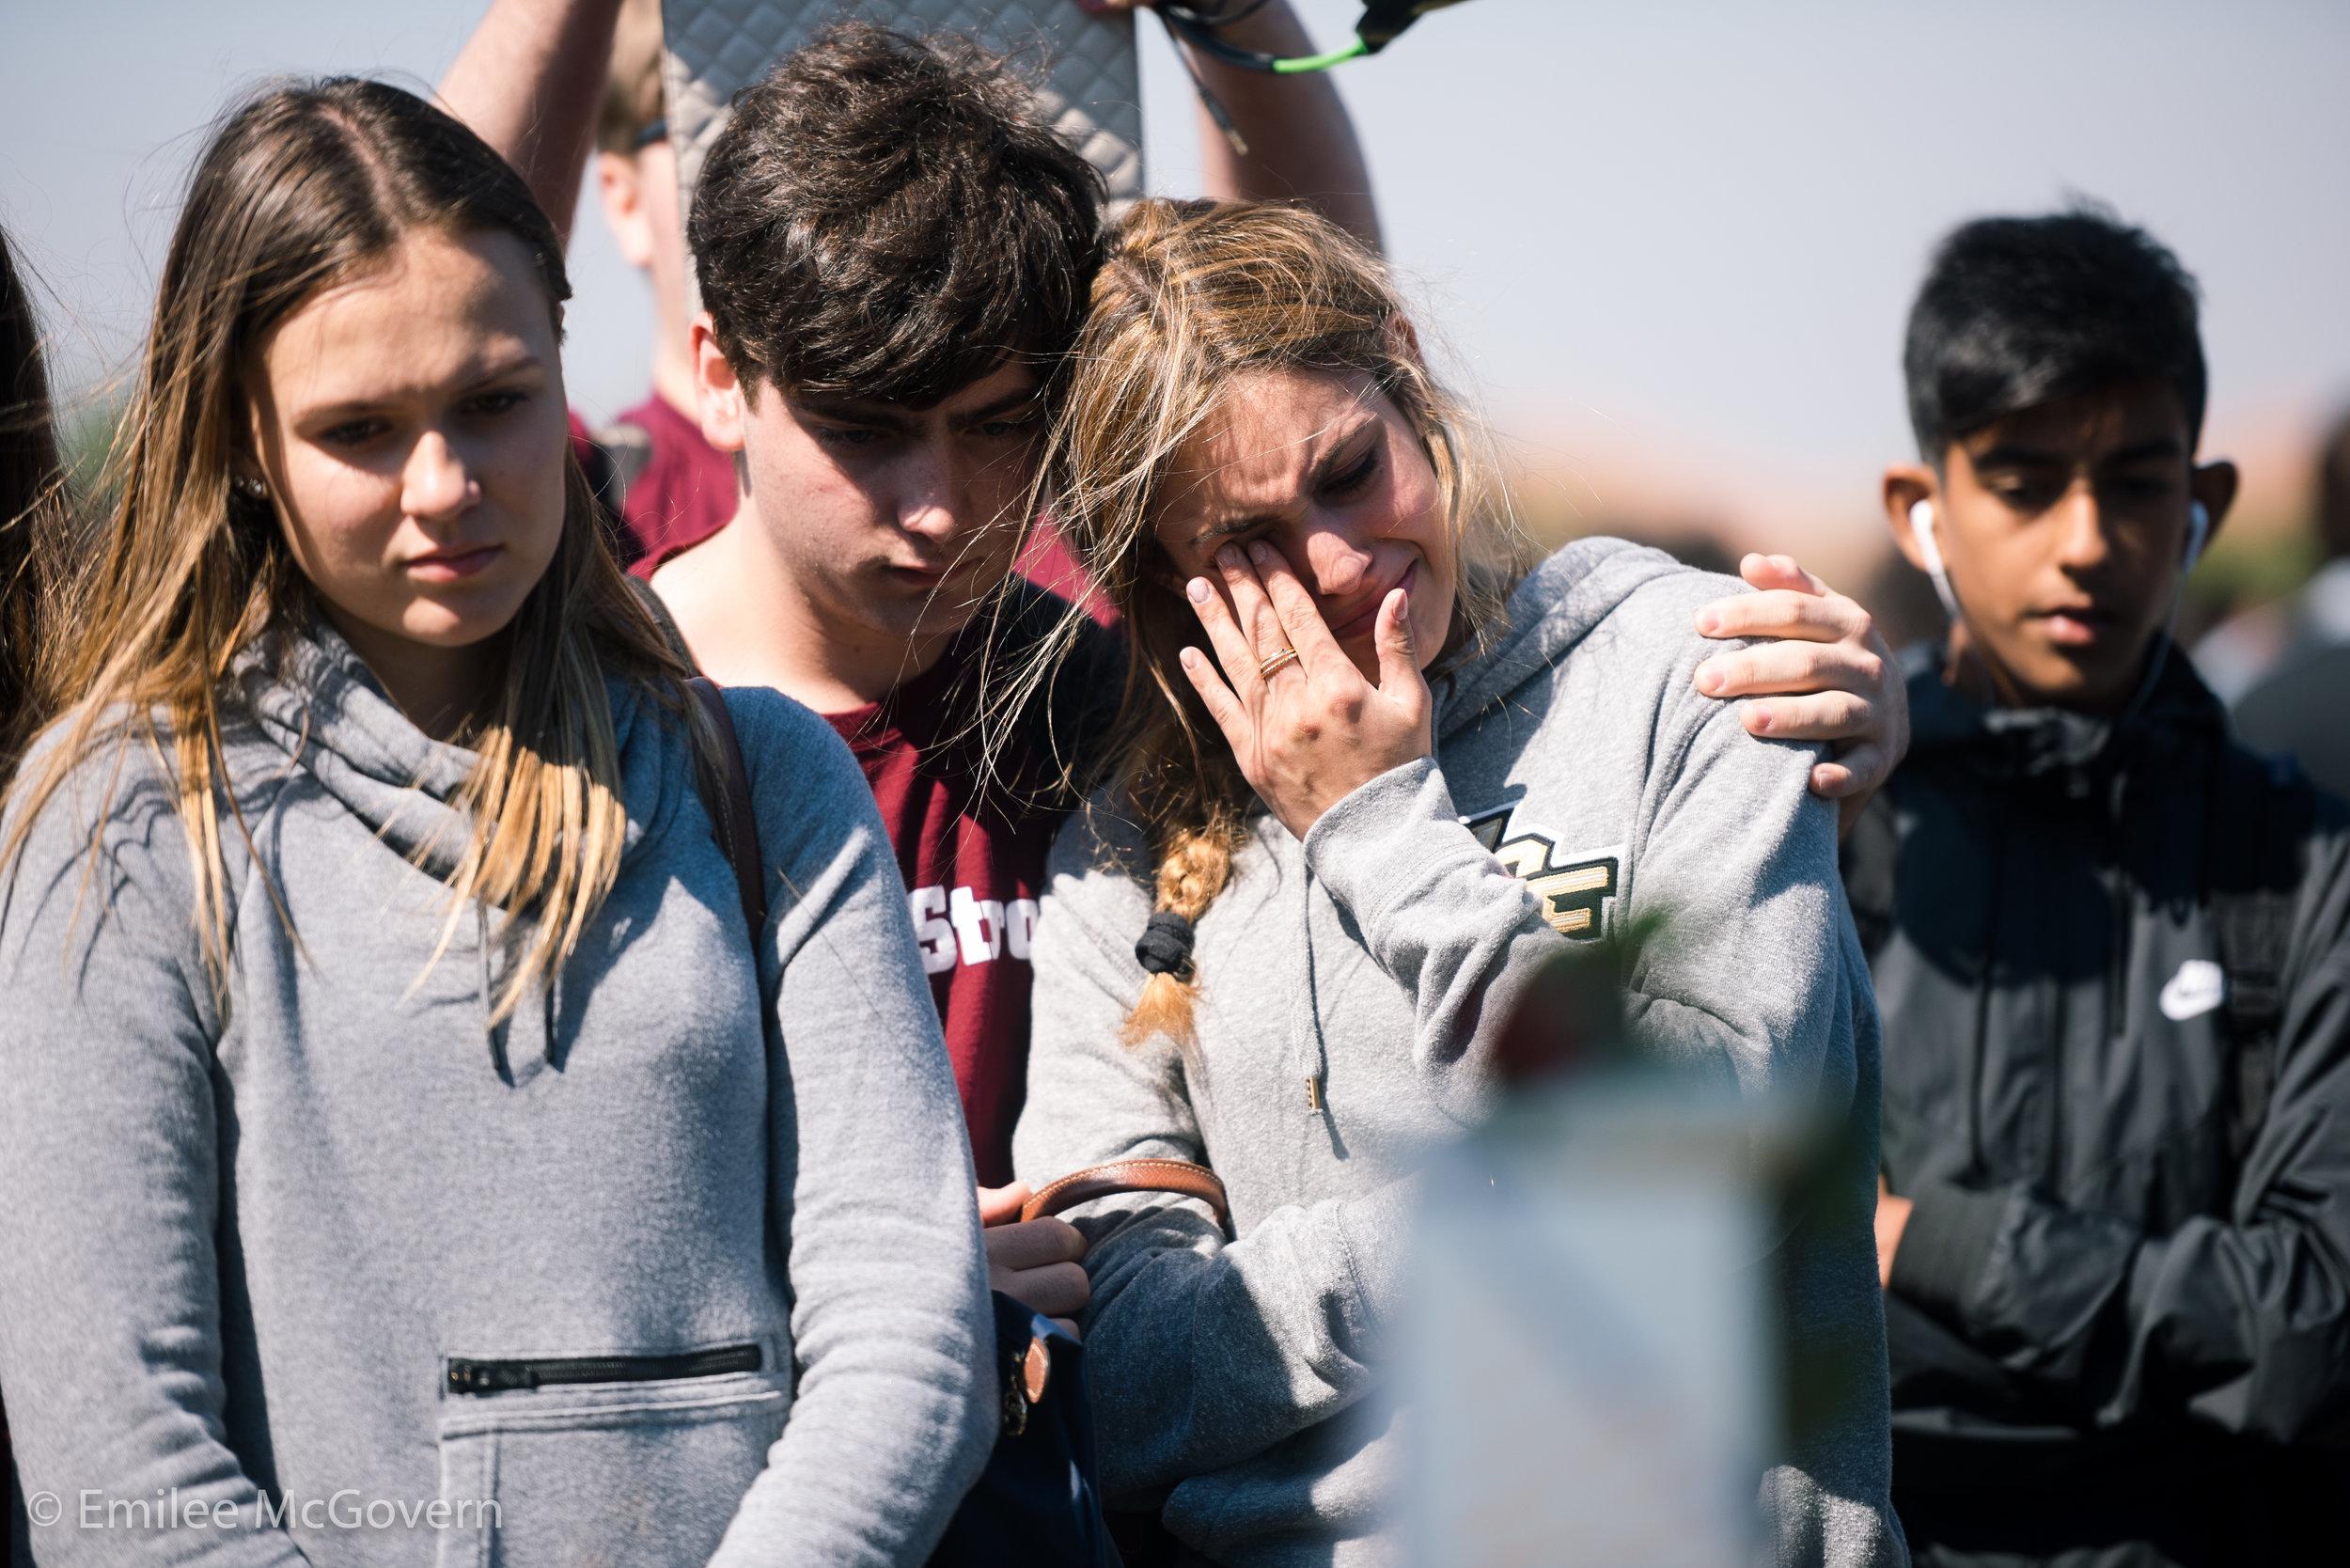 Marjory Stoneman Douglas School Shooting never again enough is enough emma gonzalez david hogg msd national school walkout -104.jpg